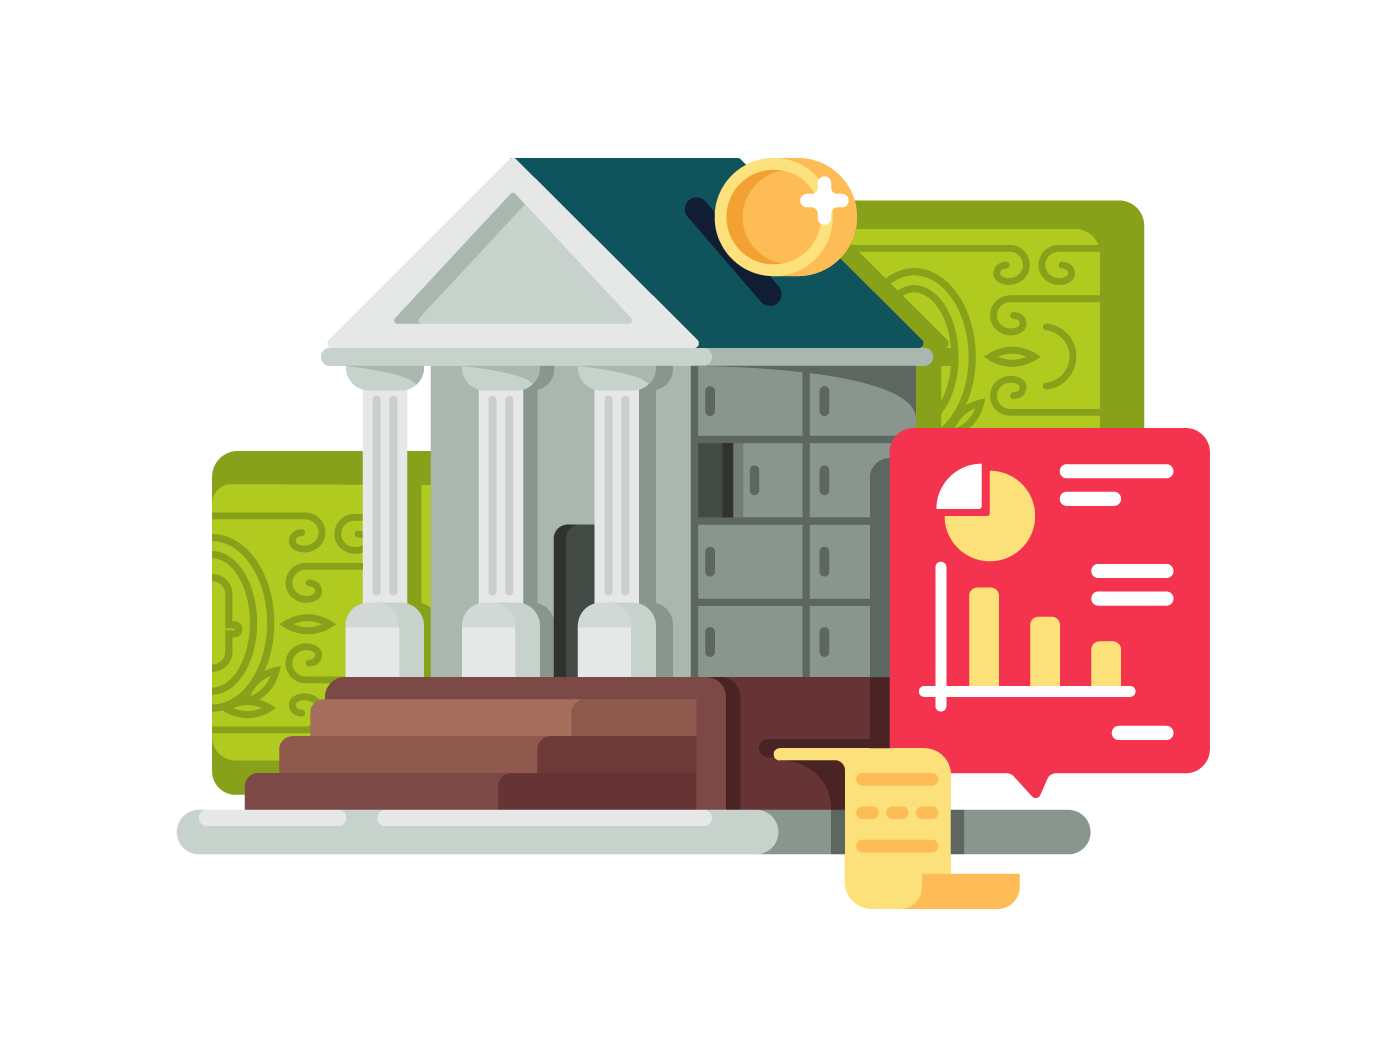 Bank and banking finance illustration